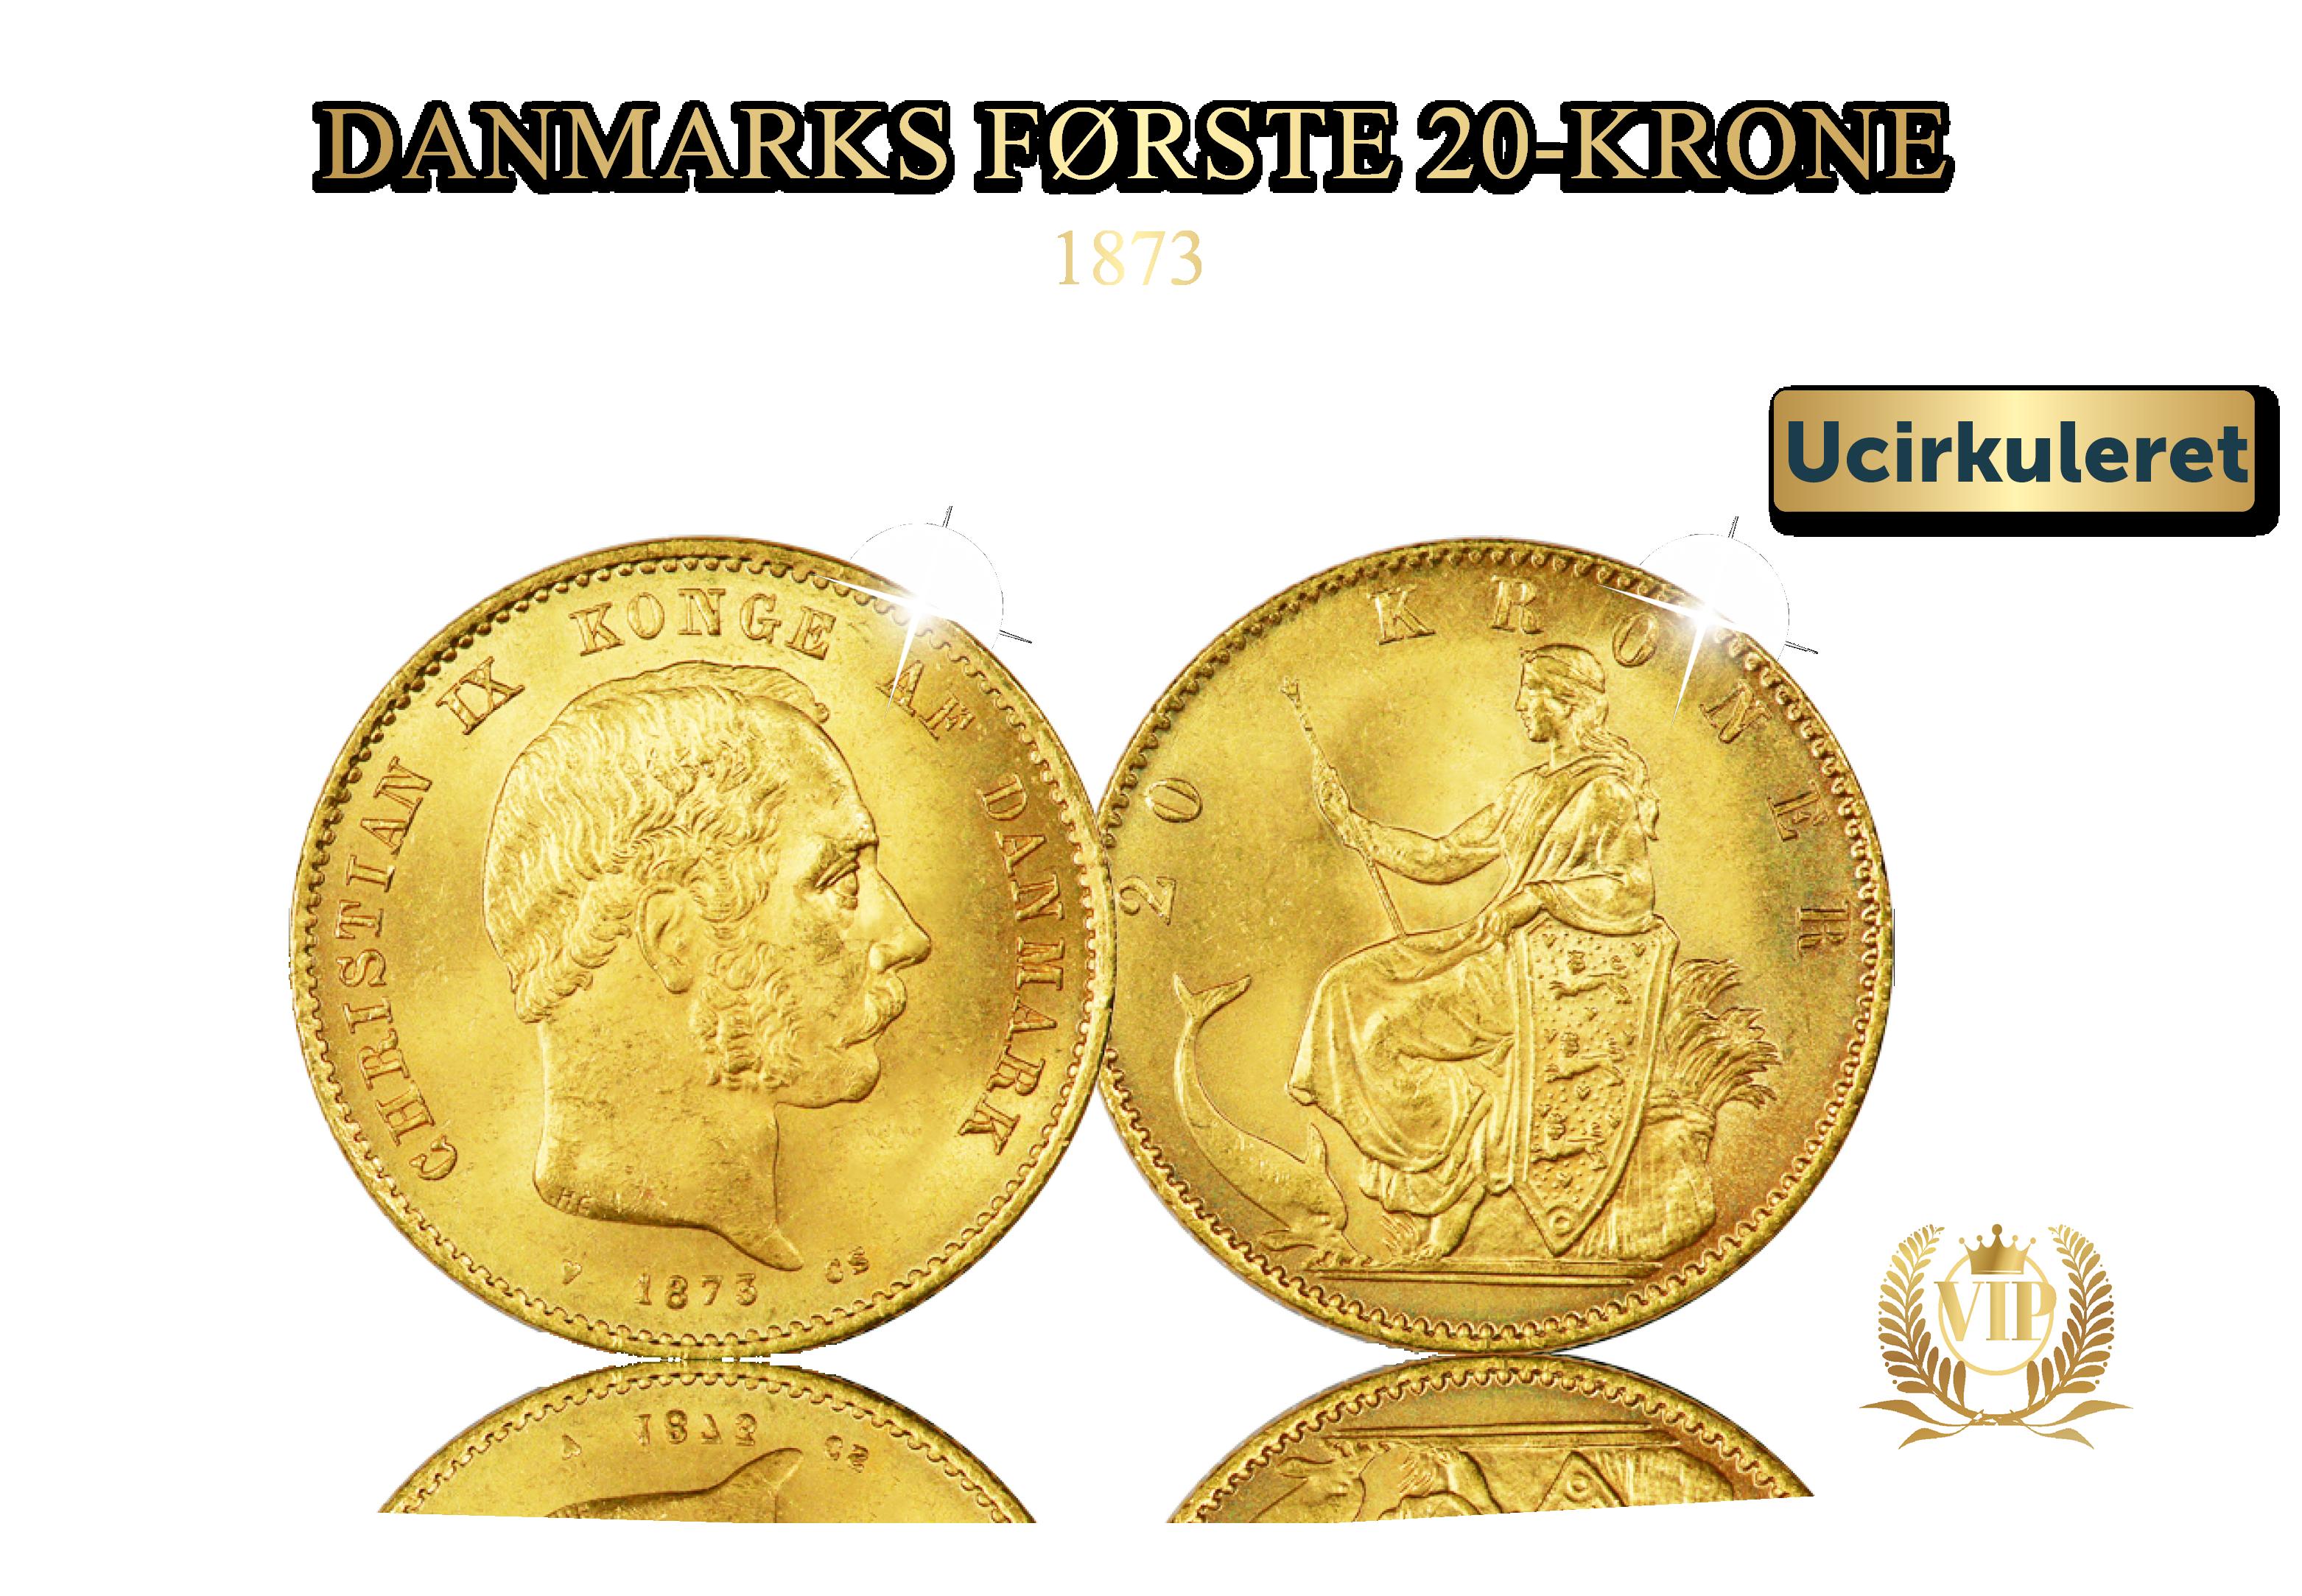 20 kr. Christian IX 1873 ucirkuleret